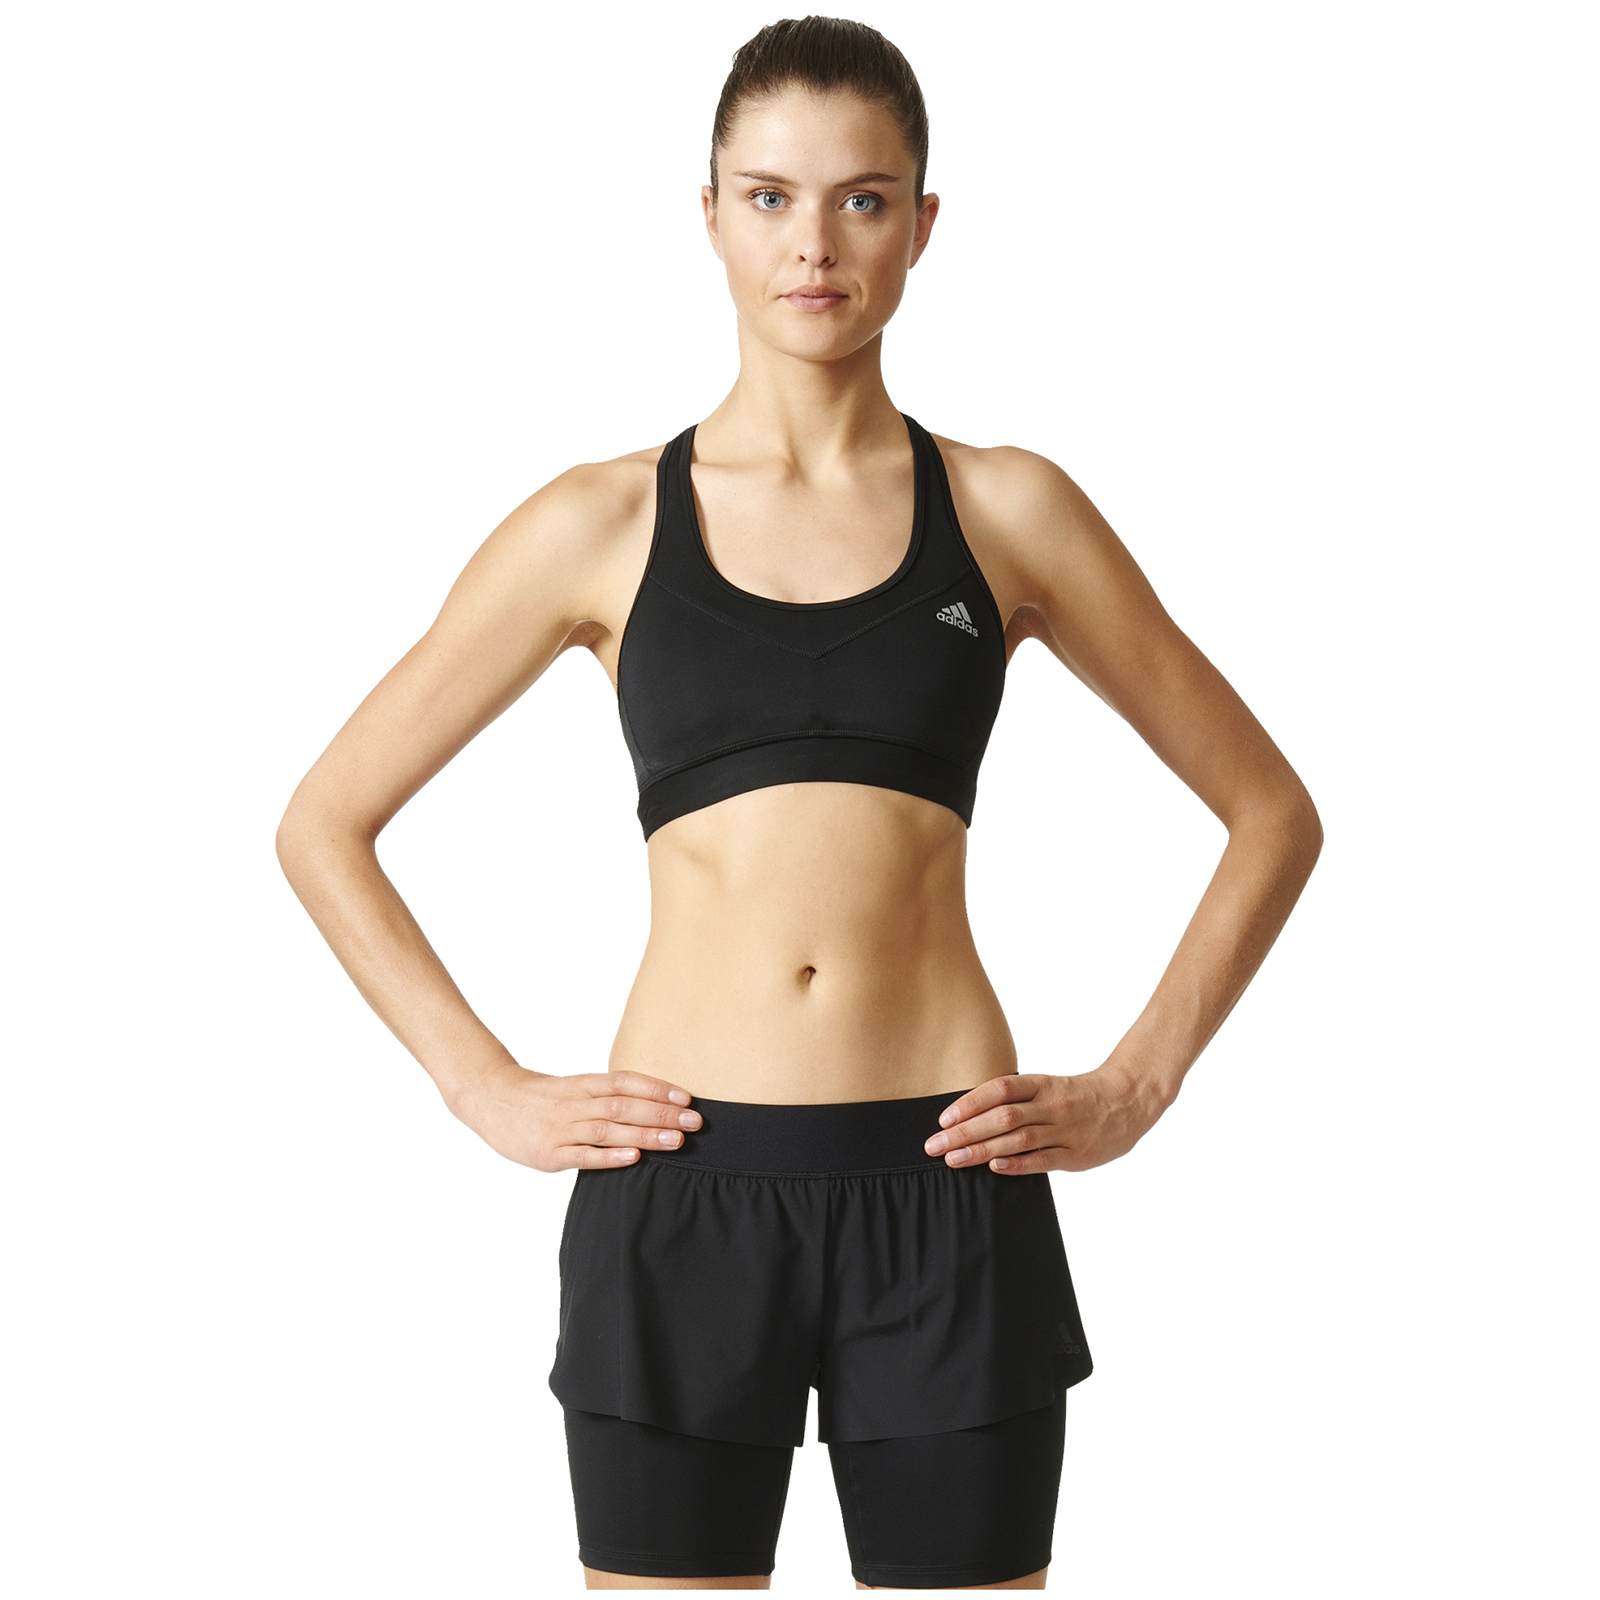 b1afd31d9b adidas Women s TechFit Medium Support Sports Bra - Black Matte Silver